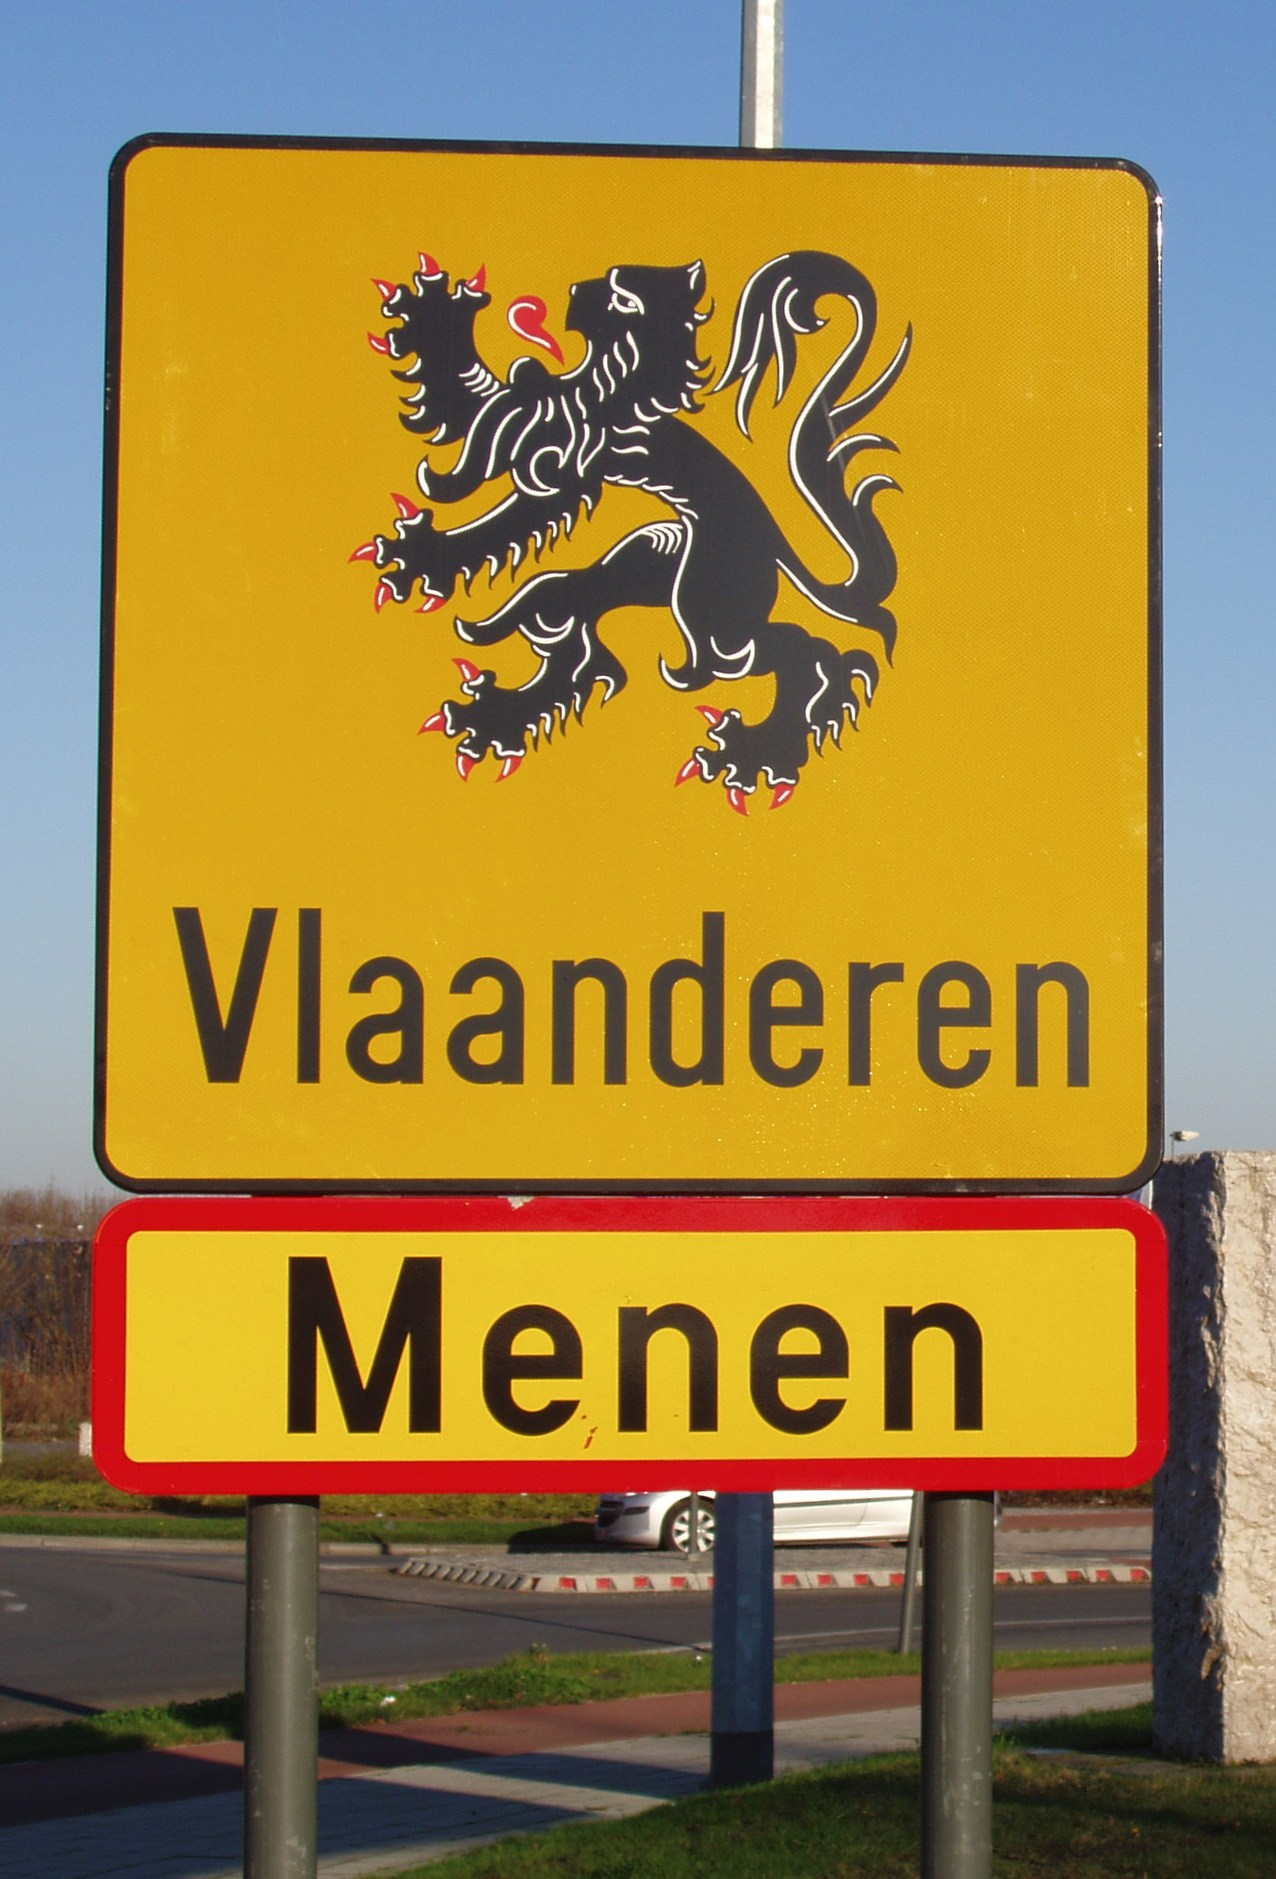 Menen - Border crossing 1 cropped.jpg